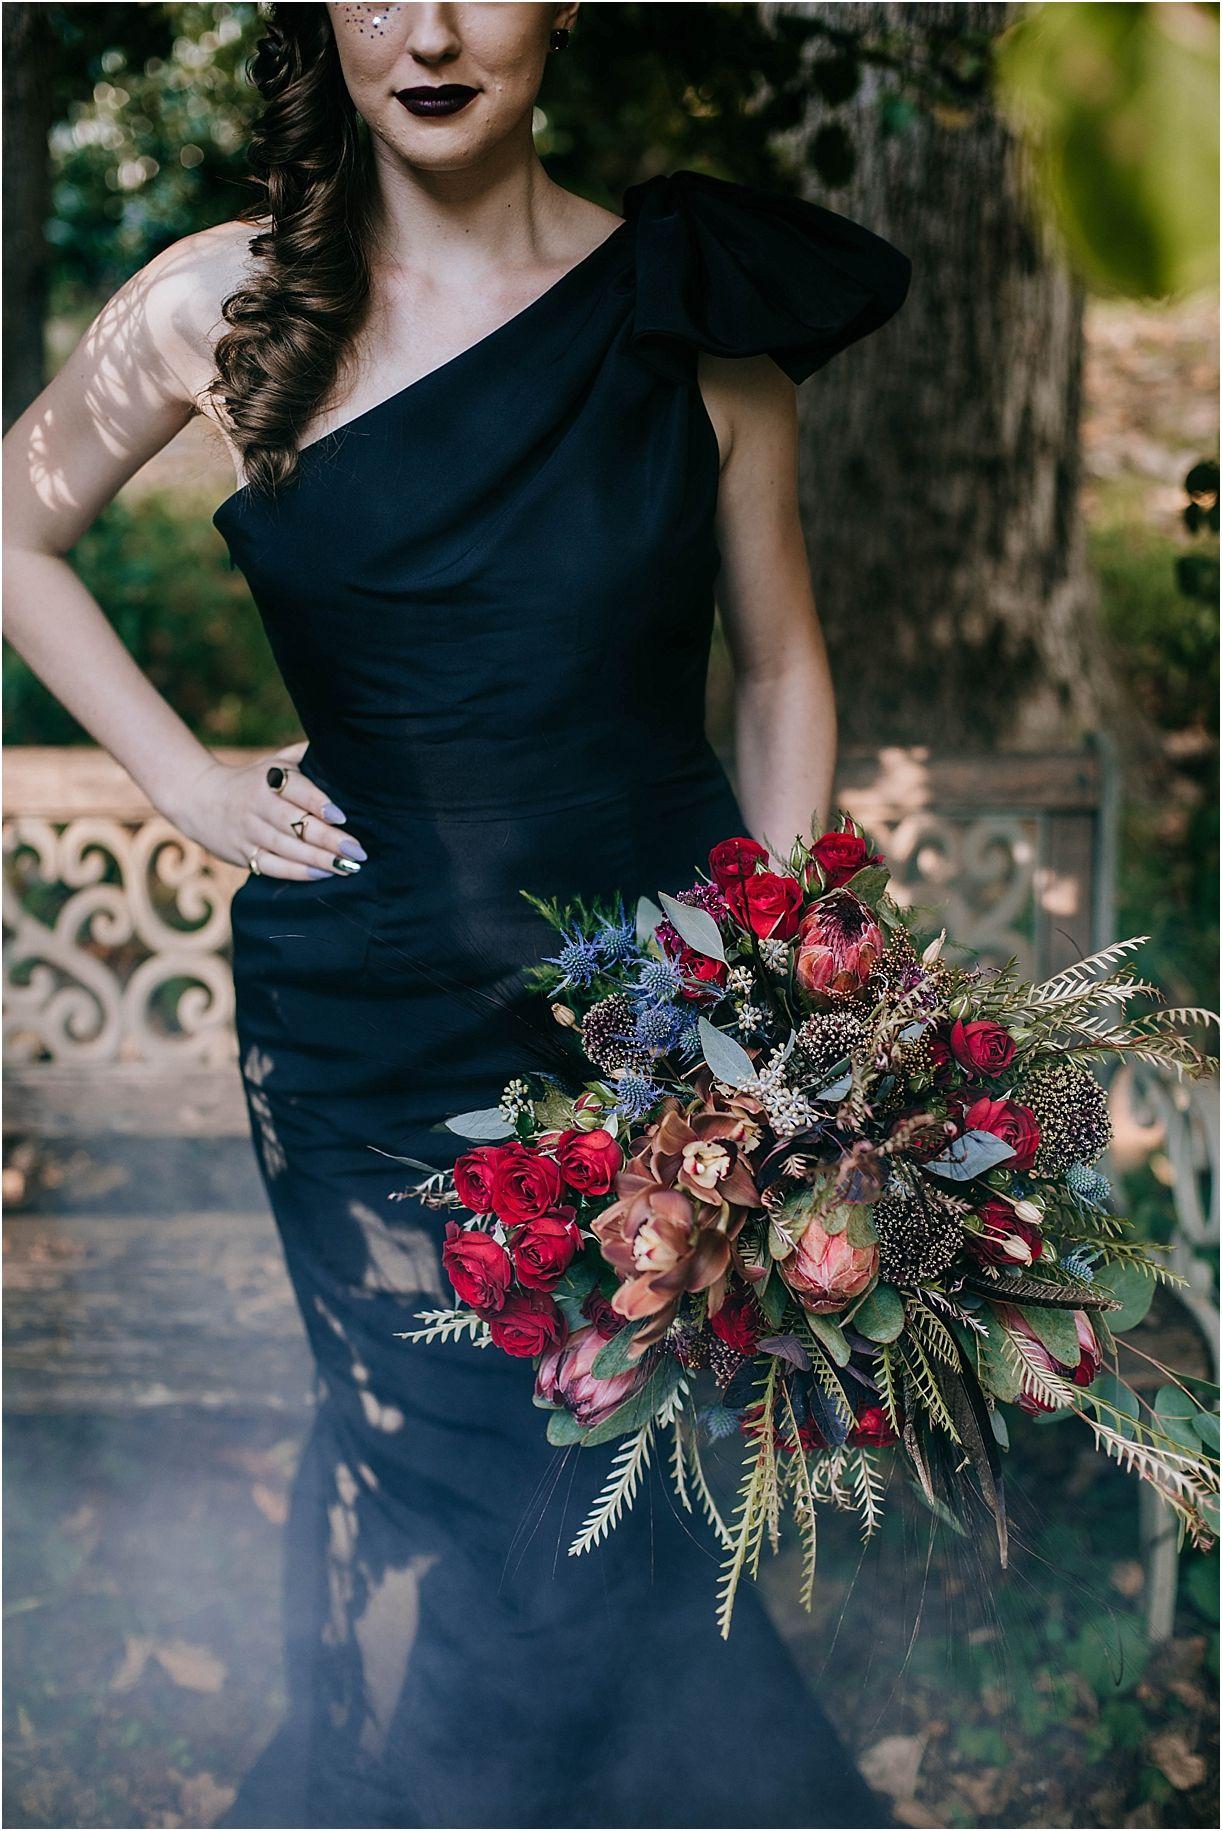 Eerily Elegant Halloween Wedding Ideas Halloween wedding